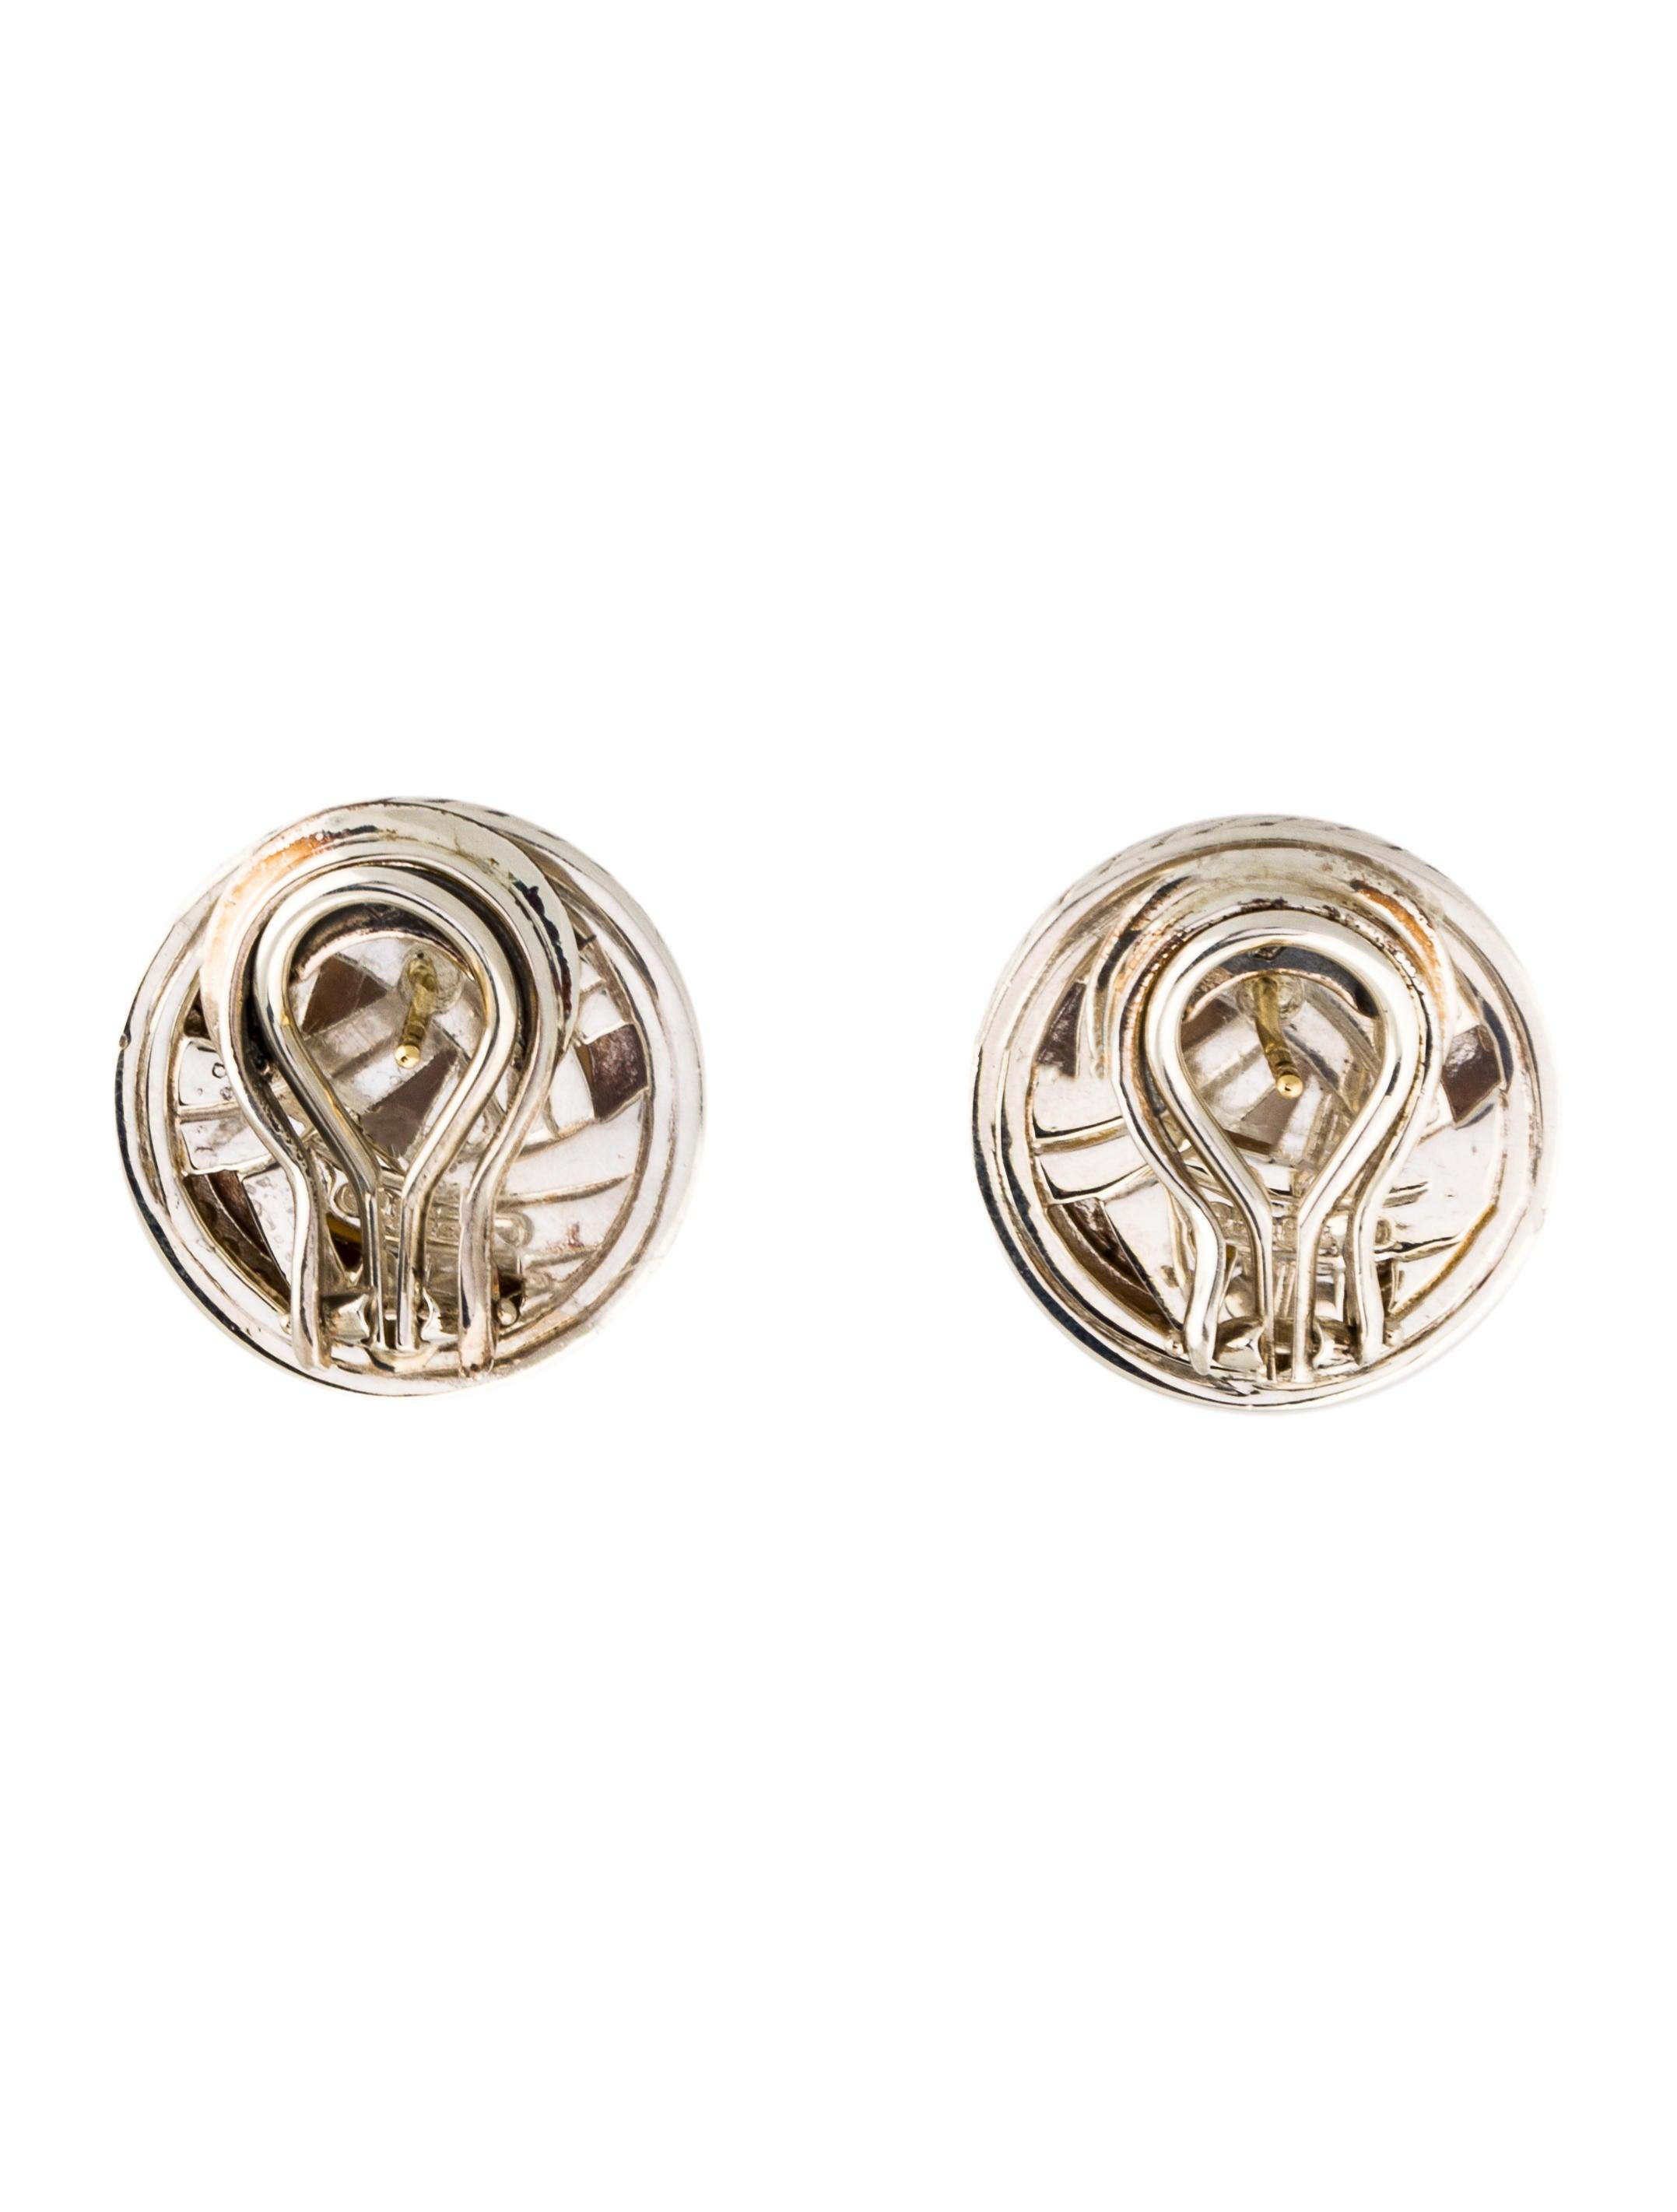 david yurman cerise pearl diamond clip on earrings. Black Bedroom Furniture Sets. Home Design Ideas